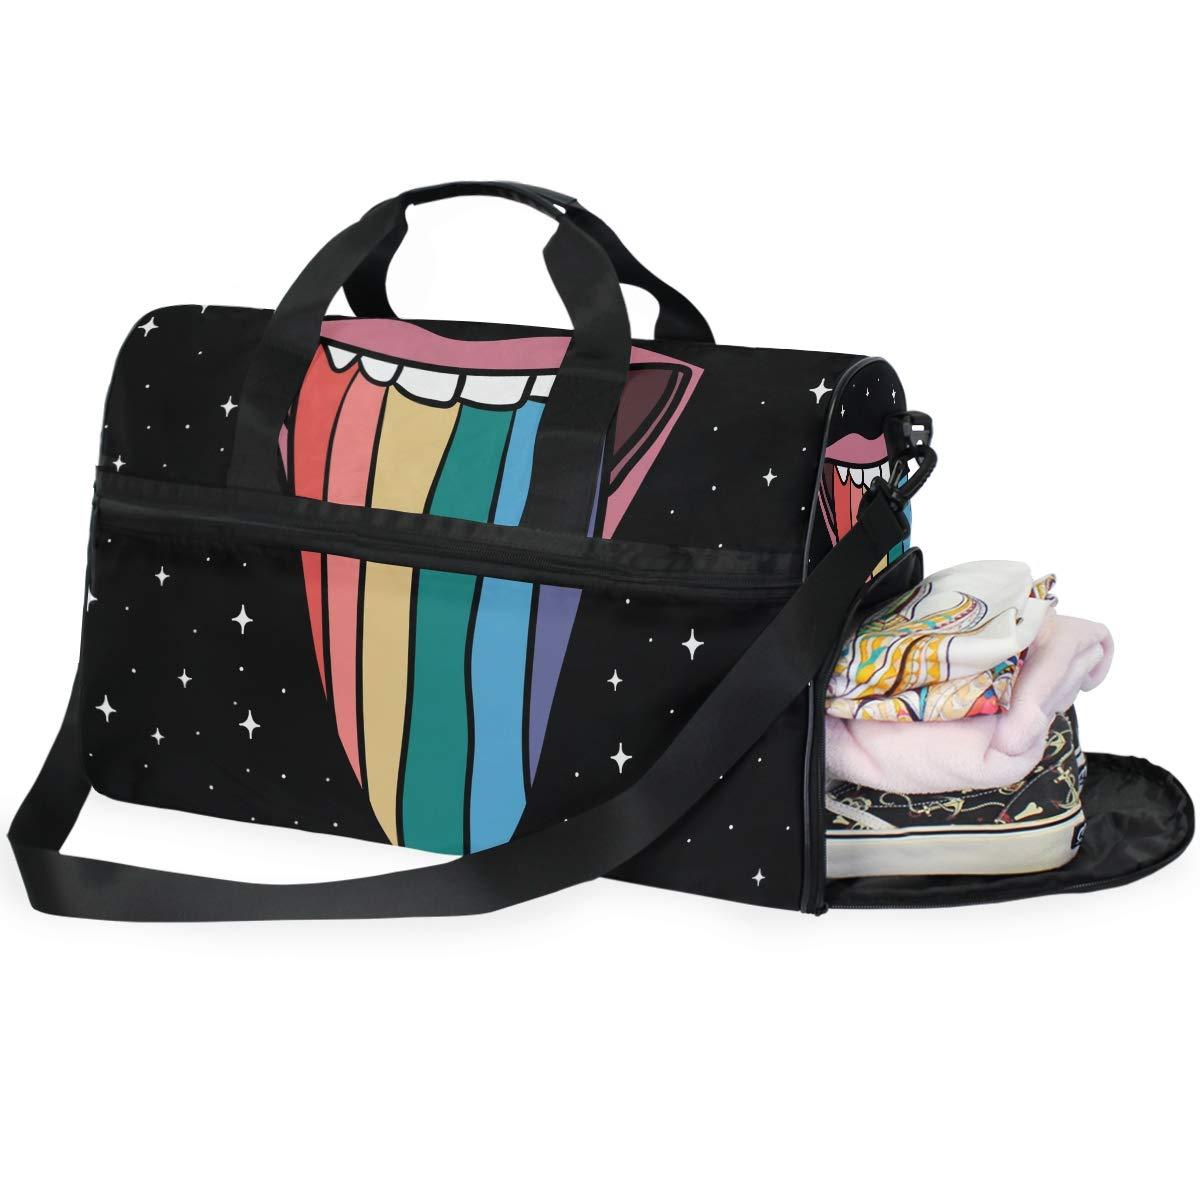 Lightweight Large Capacity Portable Duffel Bag for Men /& Women Flames Guitar Travel Duffel Bag Backpack JTRVW Luggage Bags for Travel